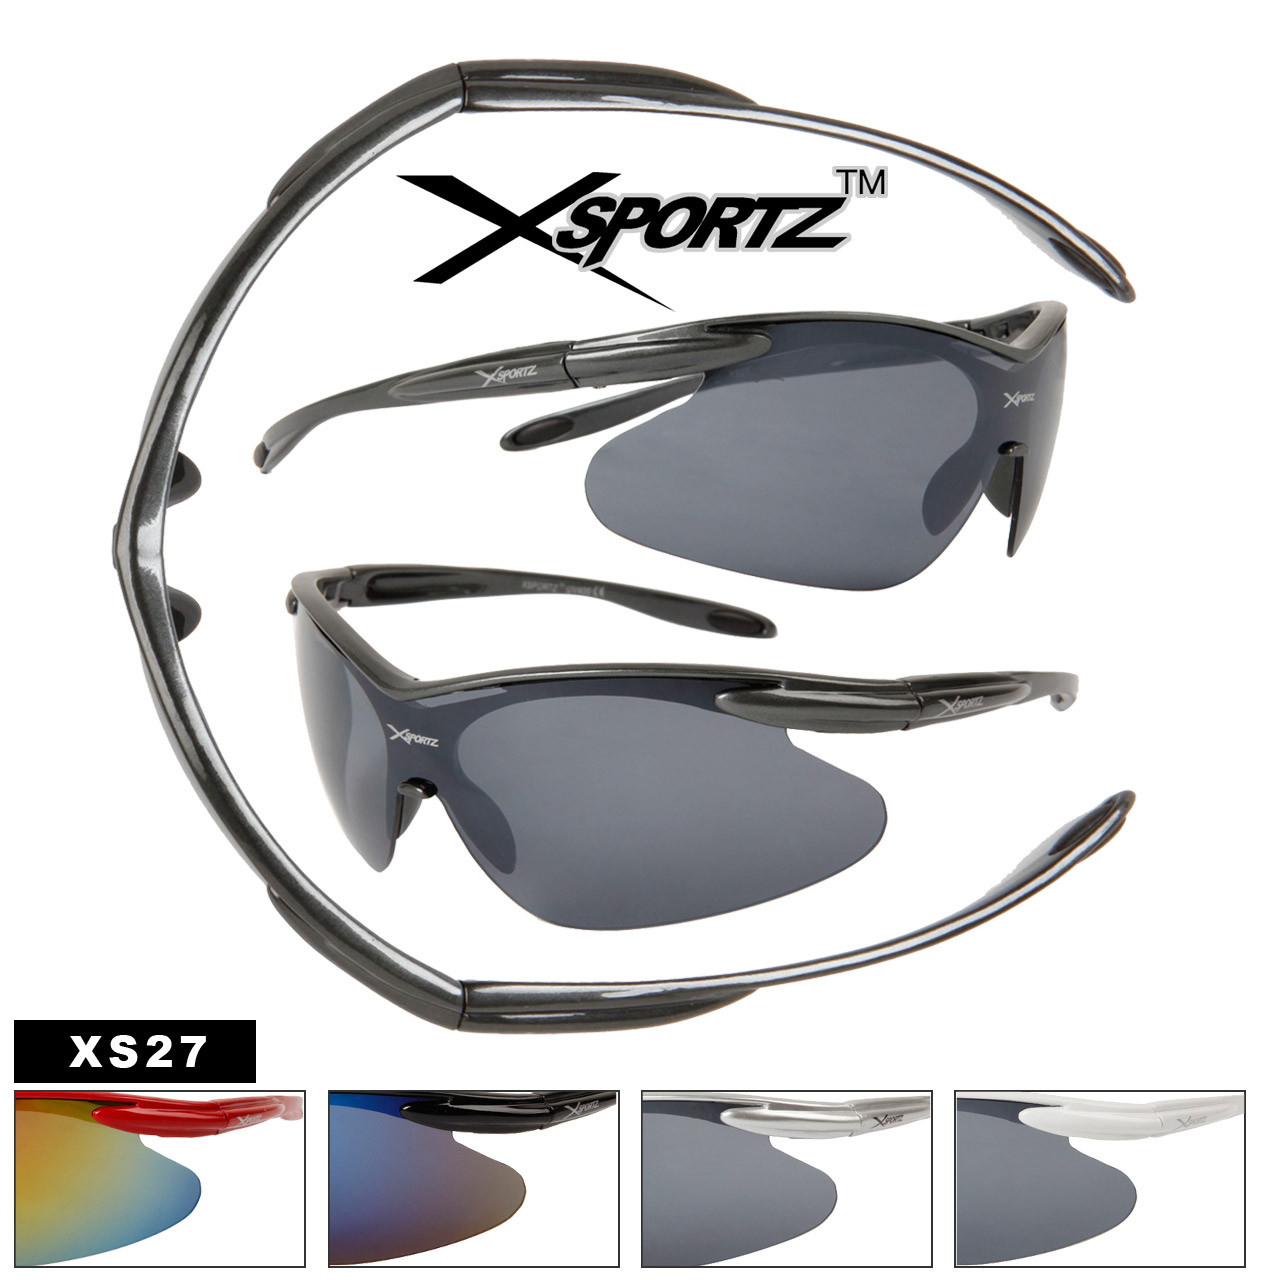 Xsportz Men's Sunglasses XS27 (Assorted Colors) (12 pcs.)